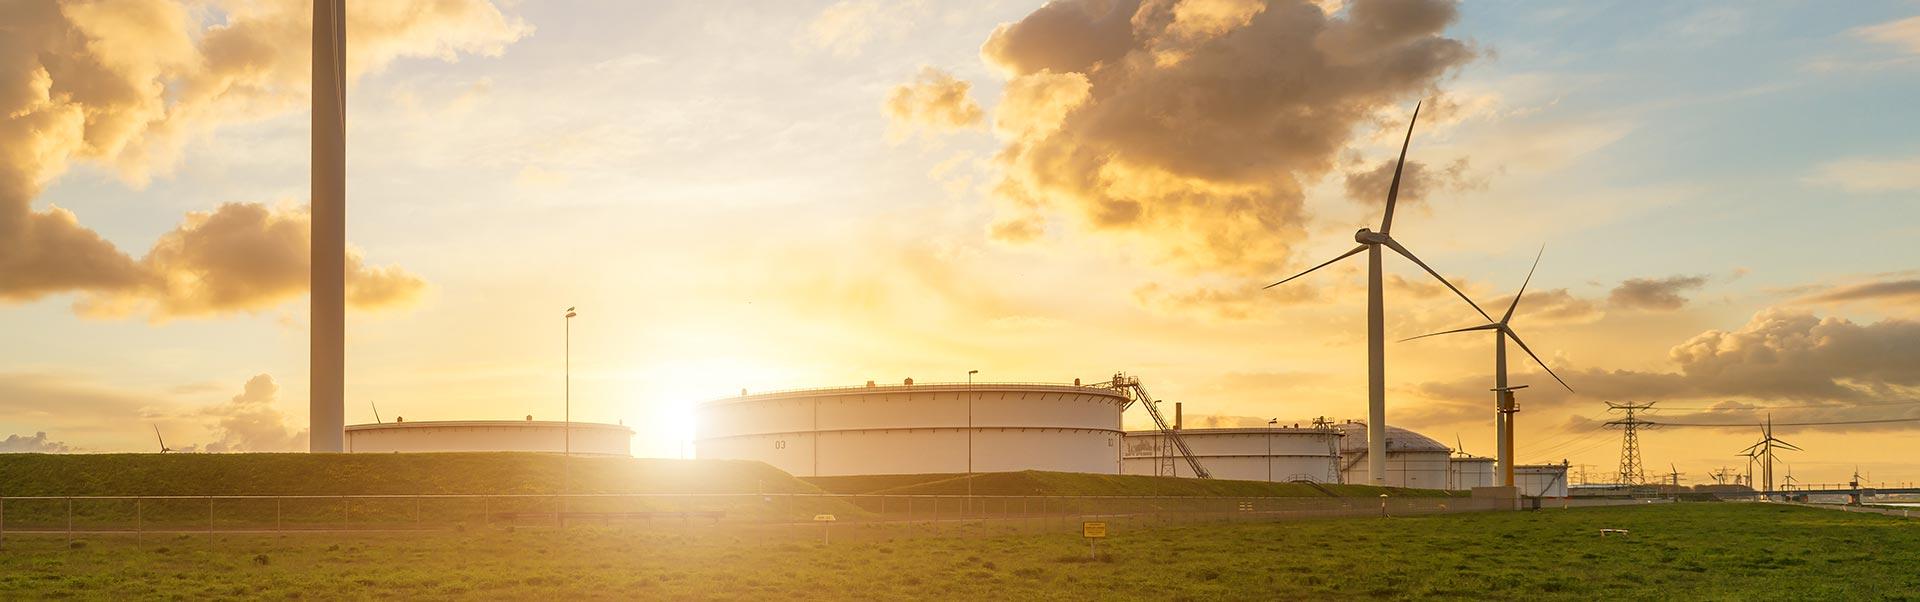 Storage Terminal Wind Farm Power Lines Oil Gas Electricity Sunset EIPIX EIPFX Fund